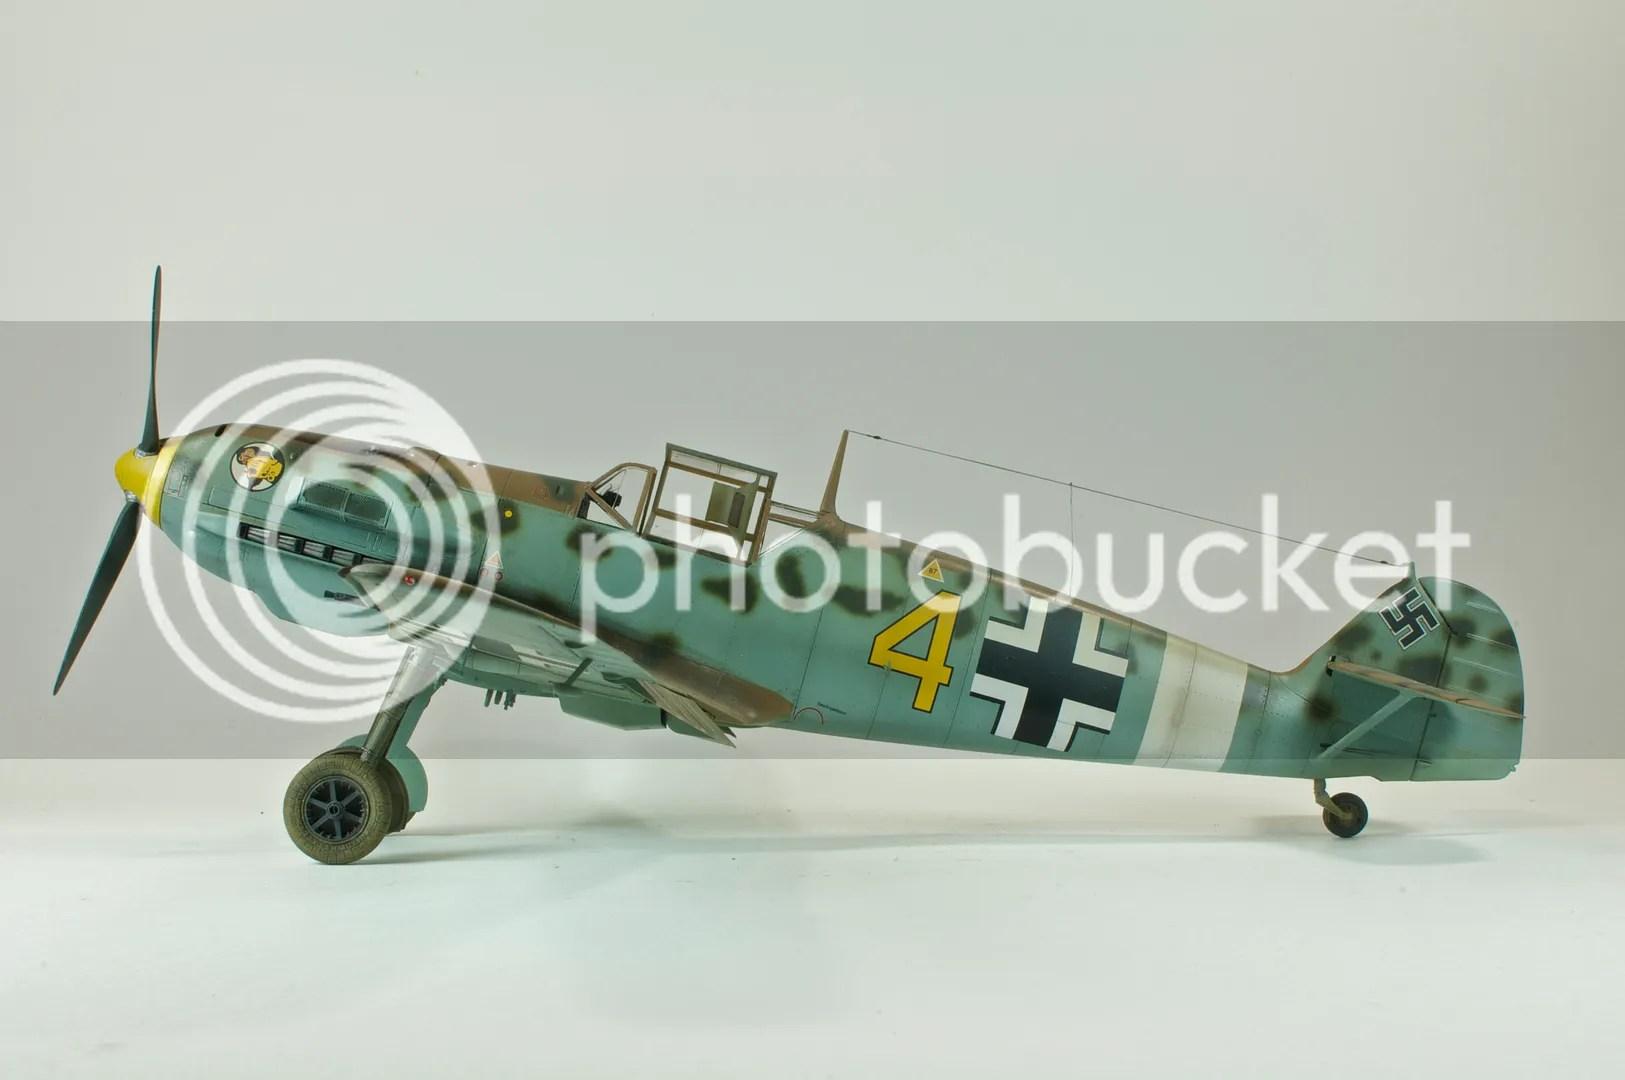 Bf 109E-7 Trop,1/32,Eduard,2011,Nikon D300s,February,scale models